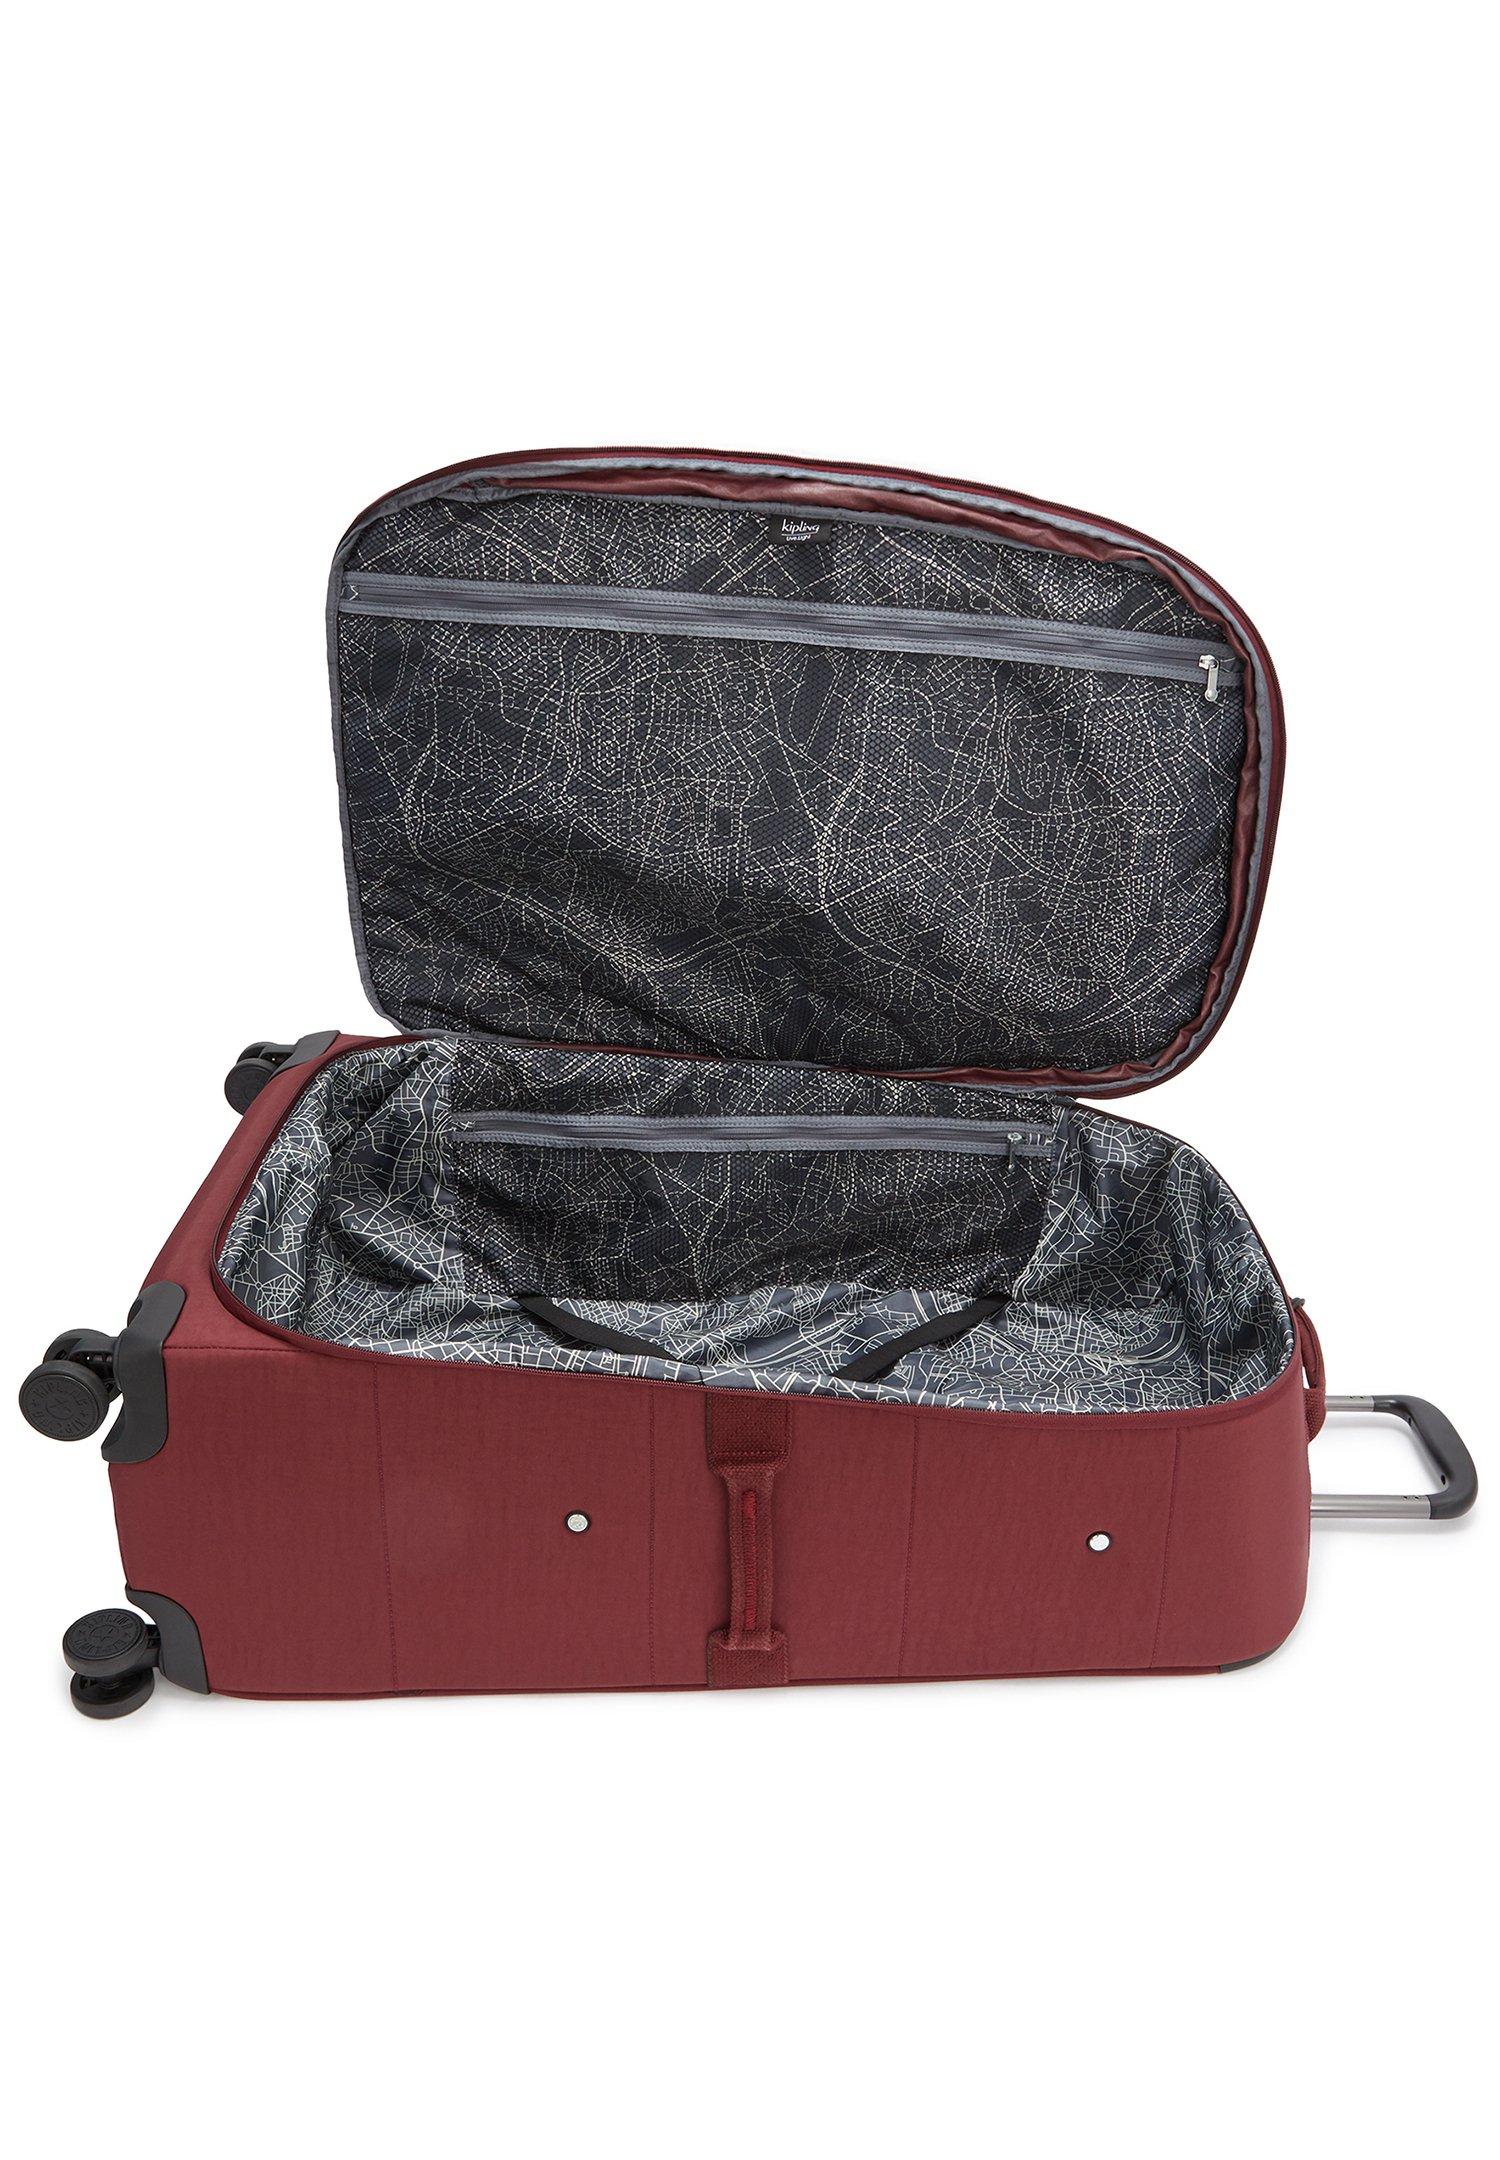 Kipling Kofferset - intense maroon/rot - Herrentaschen LNeEd